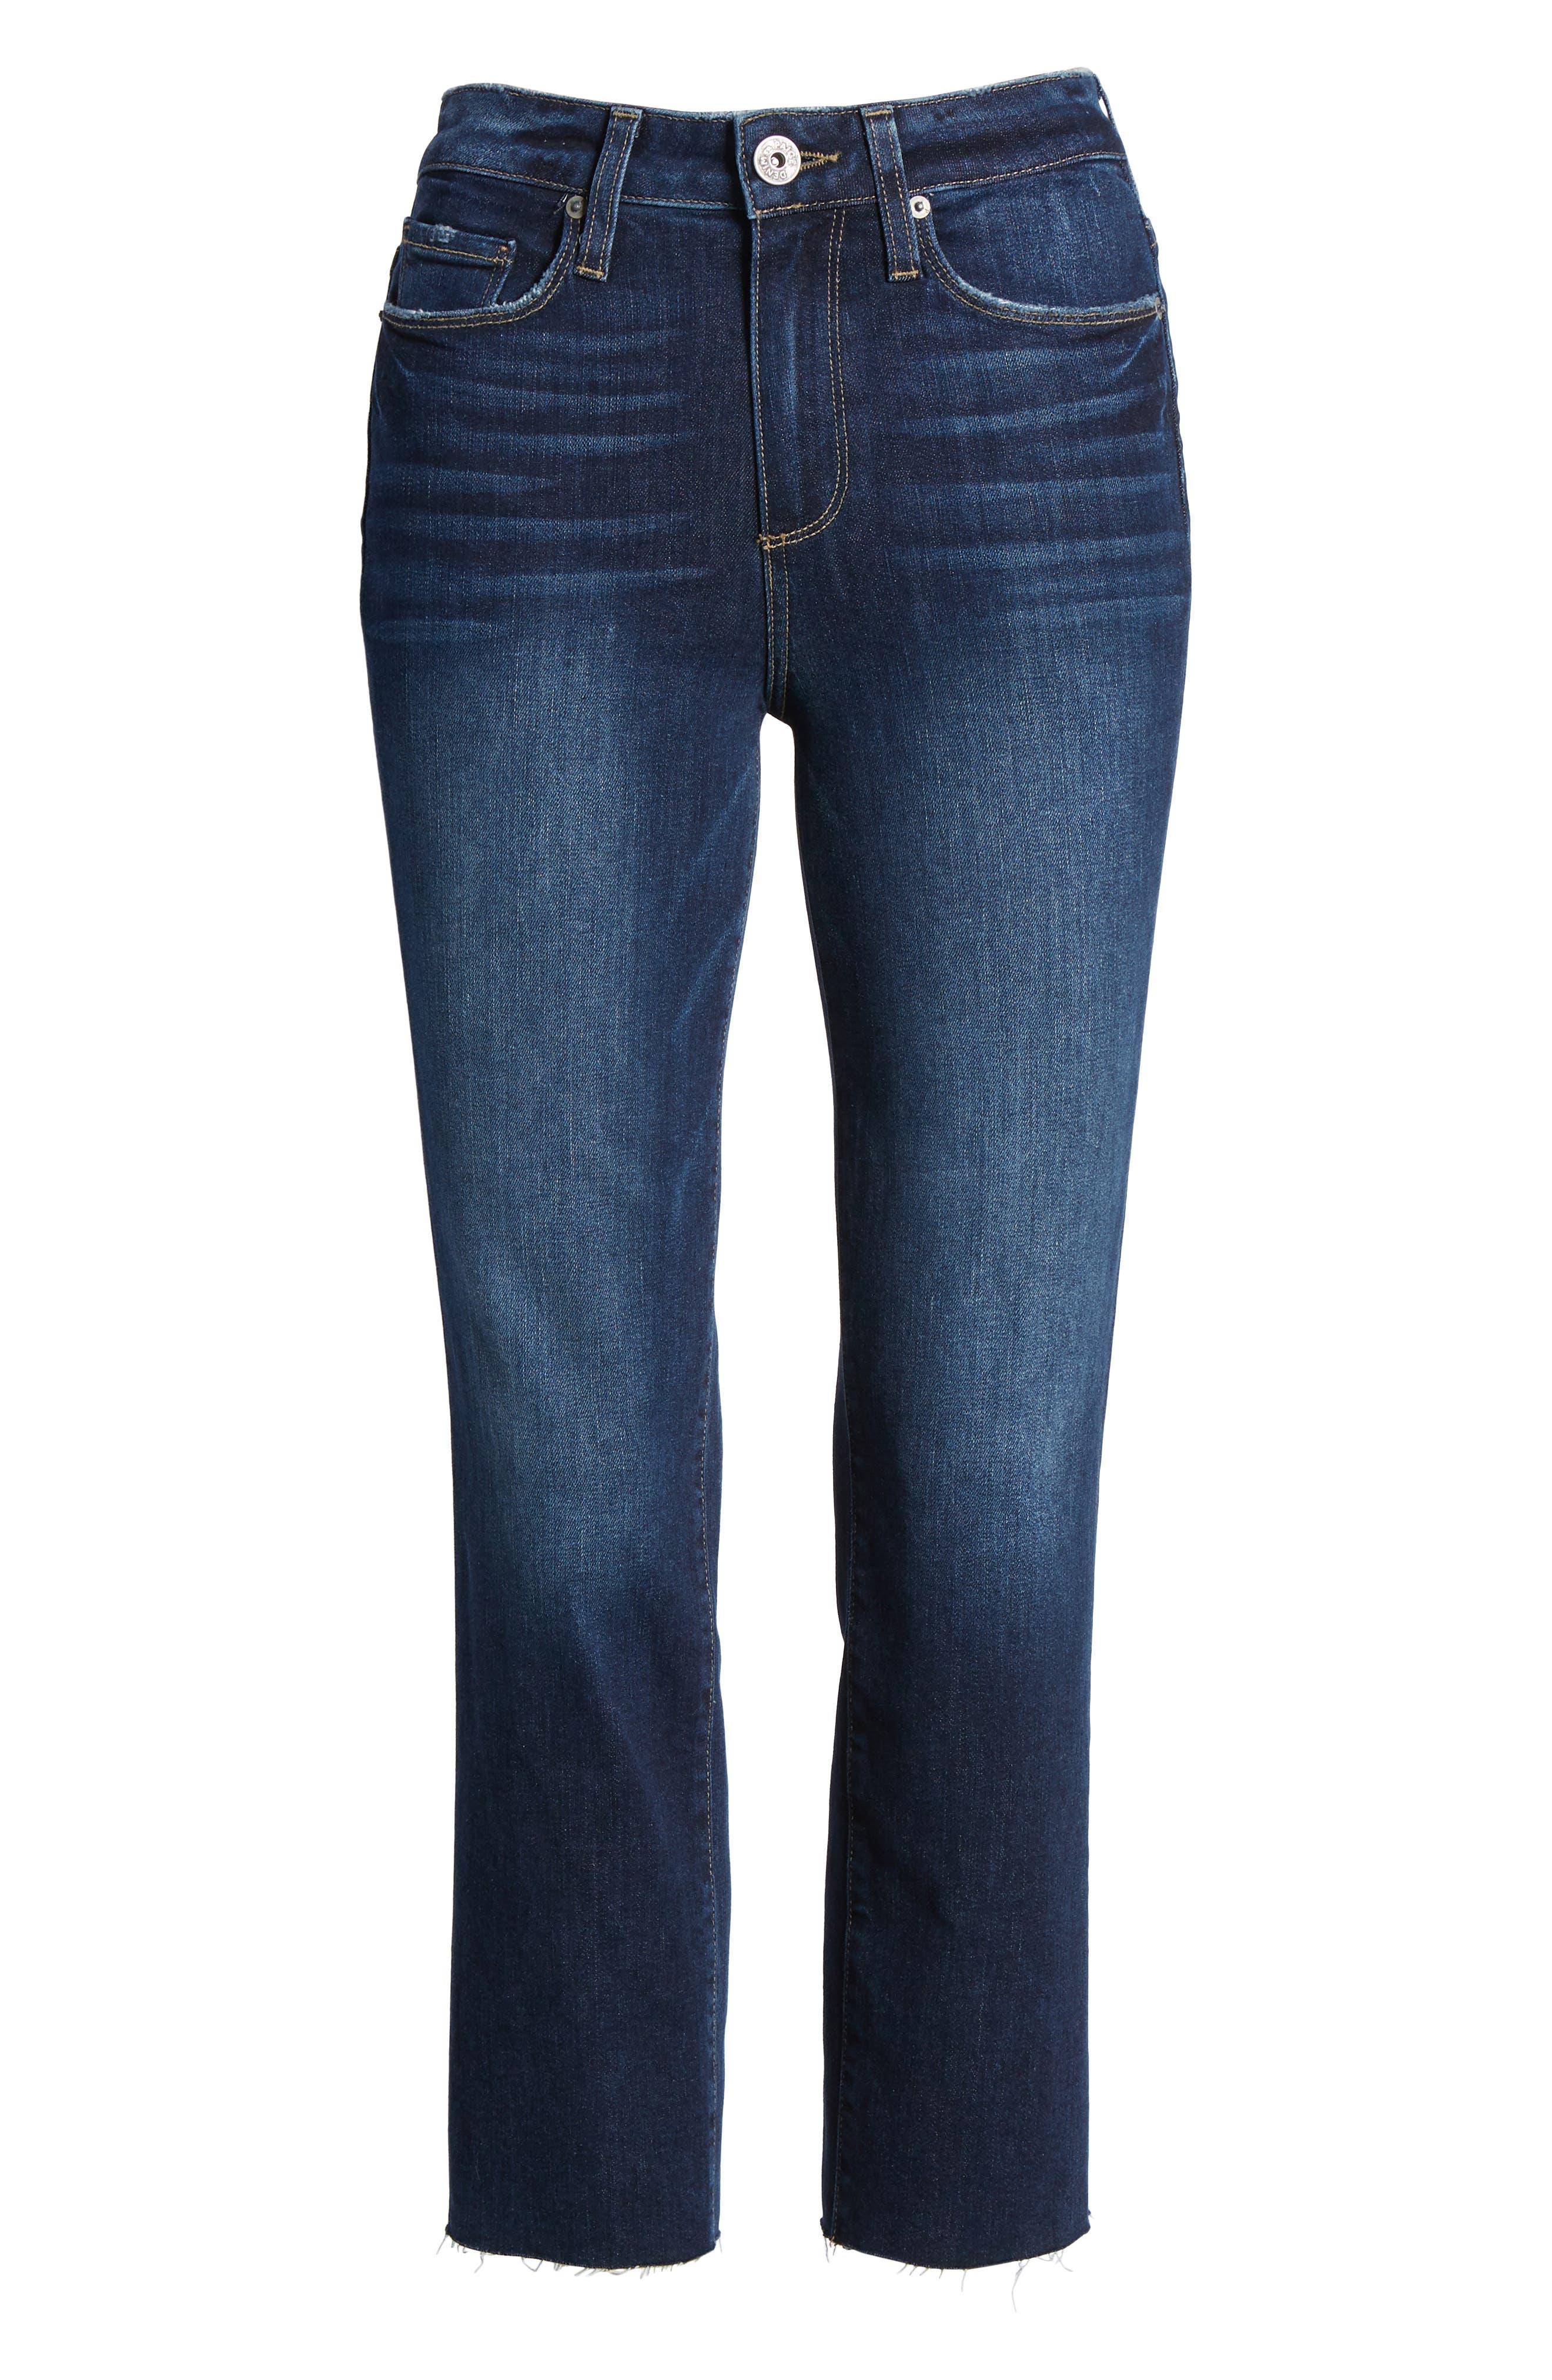 Hoxton High Waist Crop Straight Leg Jeans,                             Alternate thumbnail 6, color,                             Mazzetti